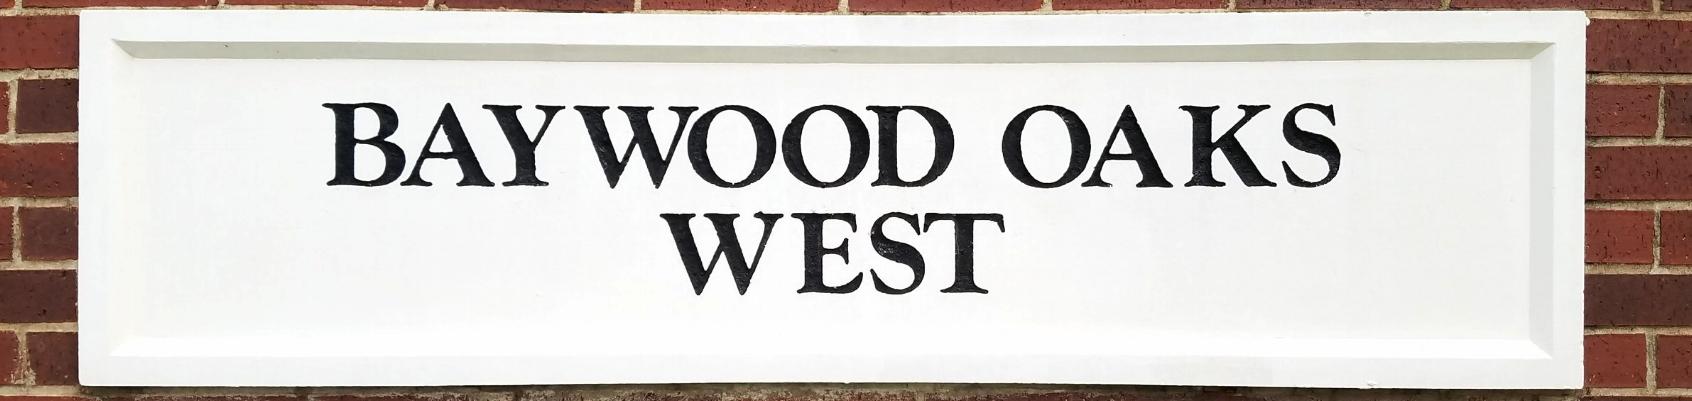 65_Baywood Oaks West.jpg